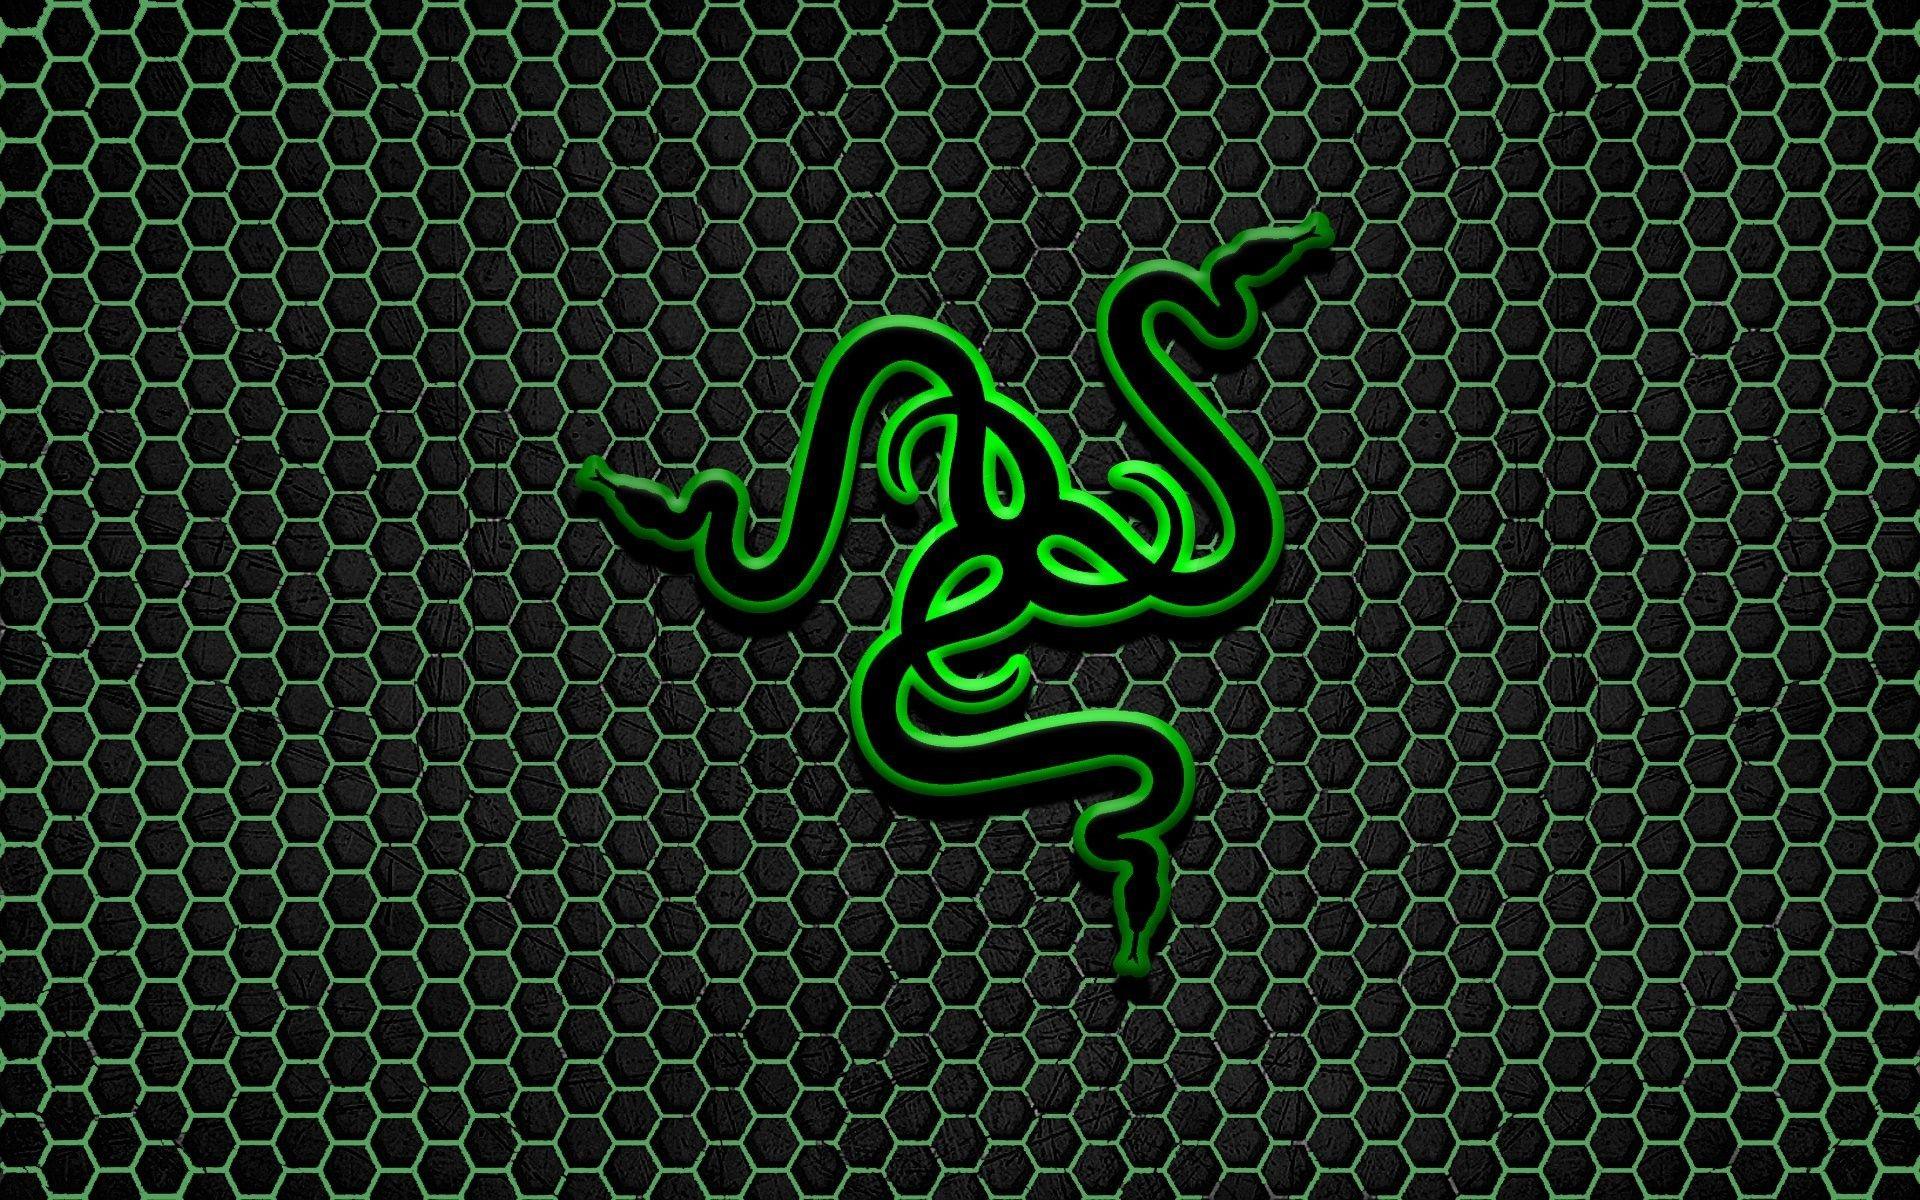 Razer Wallpaper Backgrounds Hd Razer Category